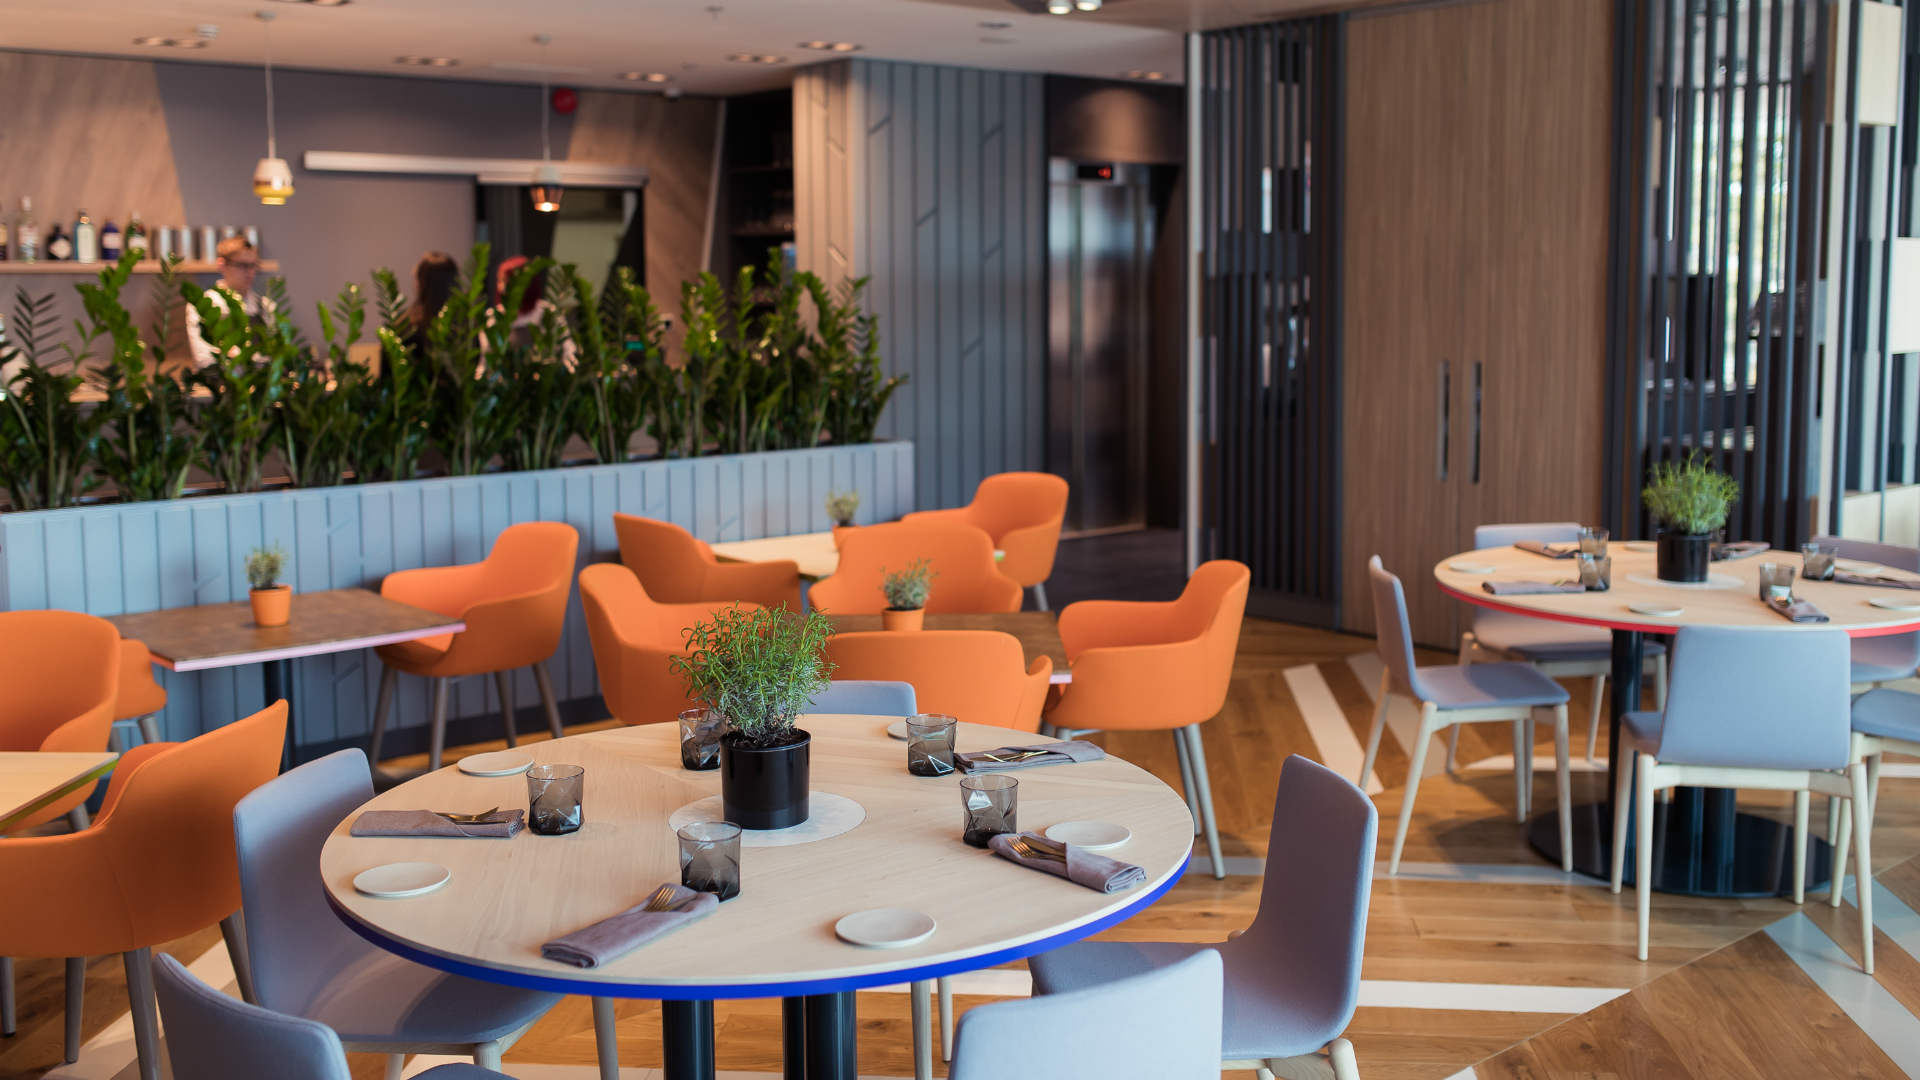 Restaurant Fii by TartuHotels | Tartu Hotels